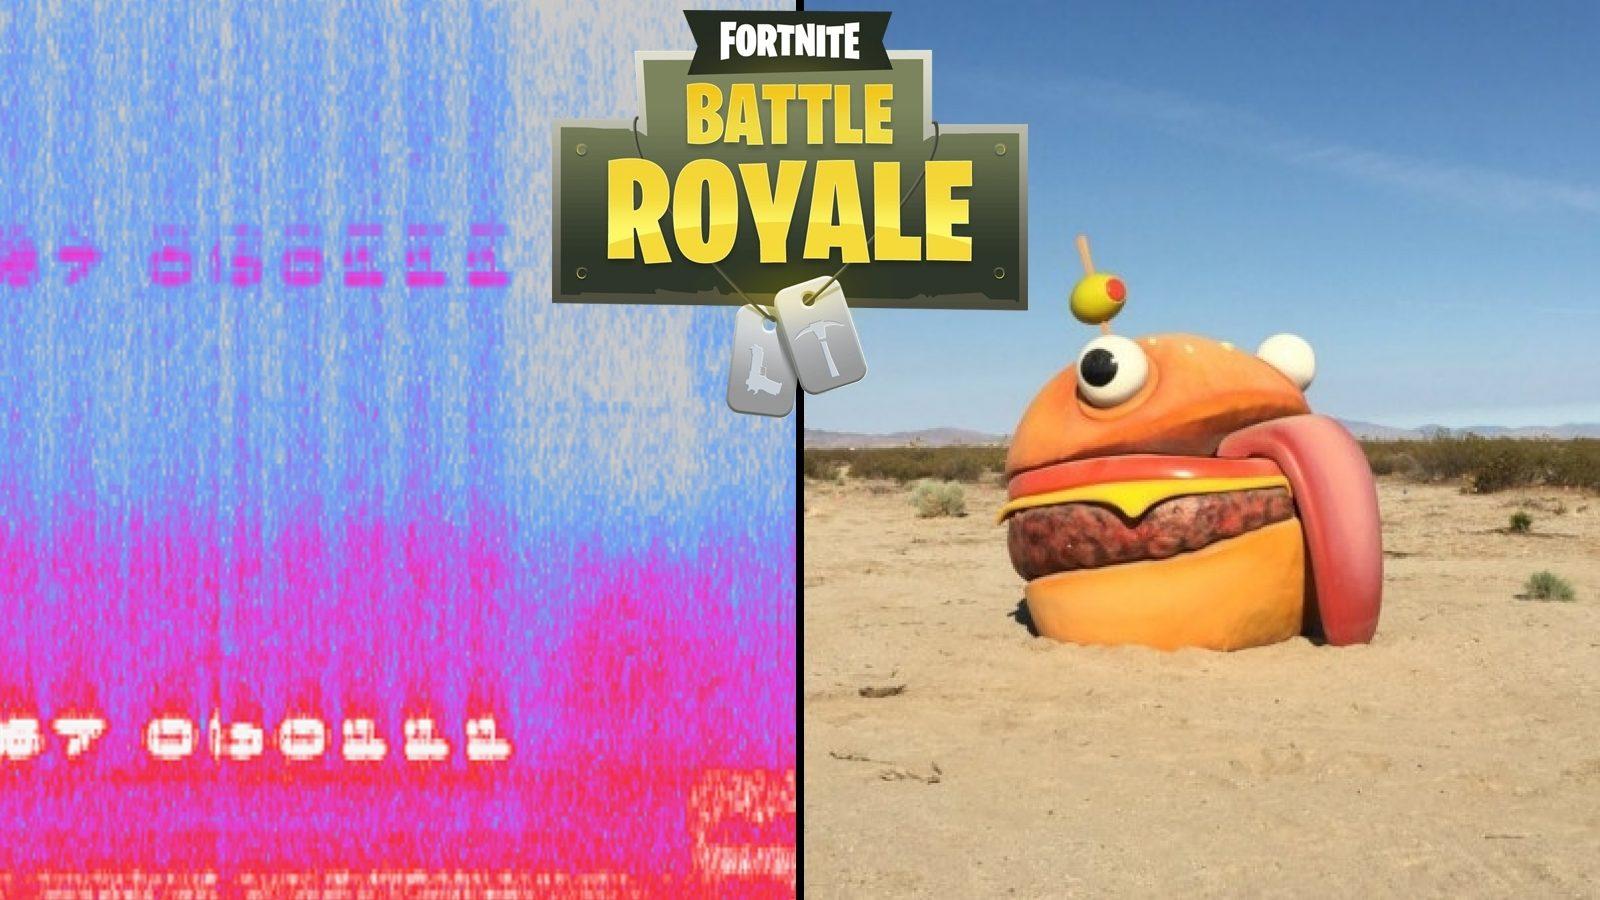 Fortnite burger worker